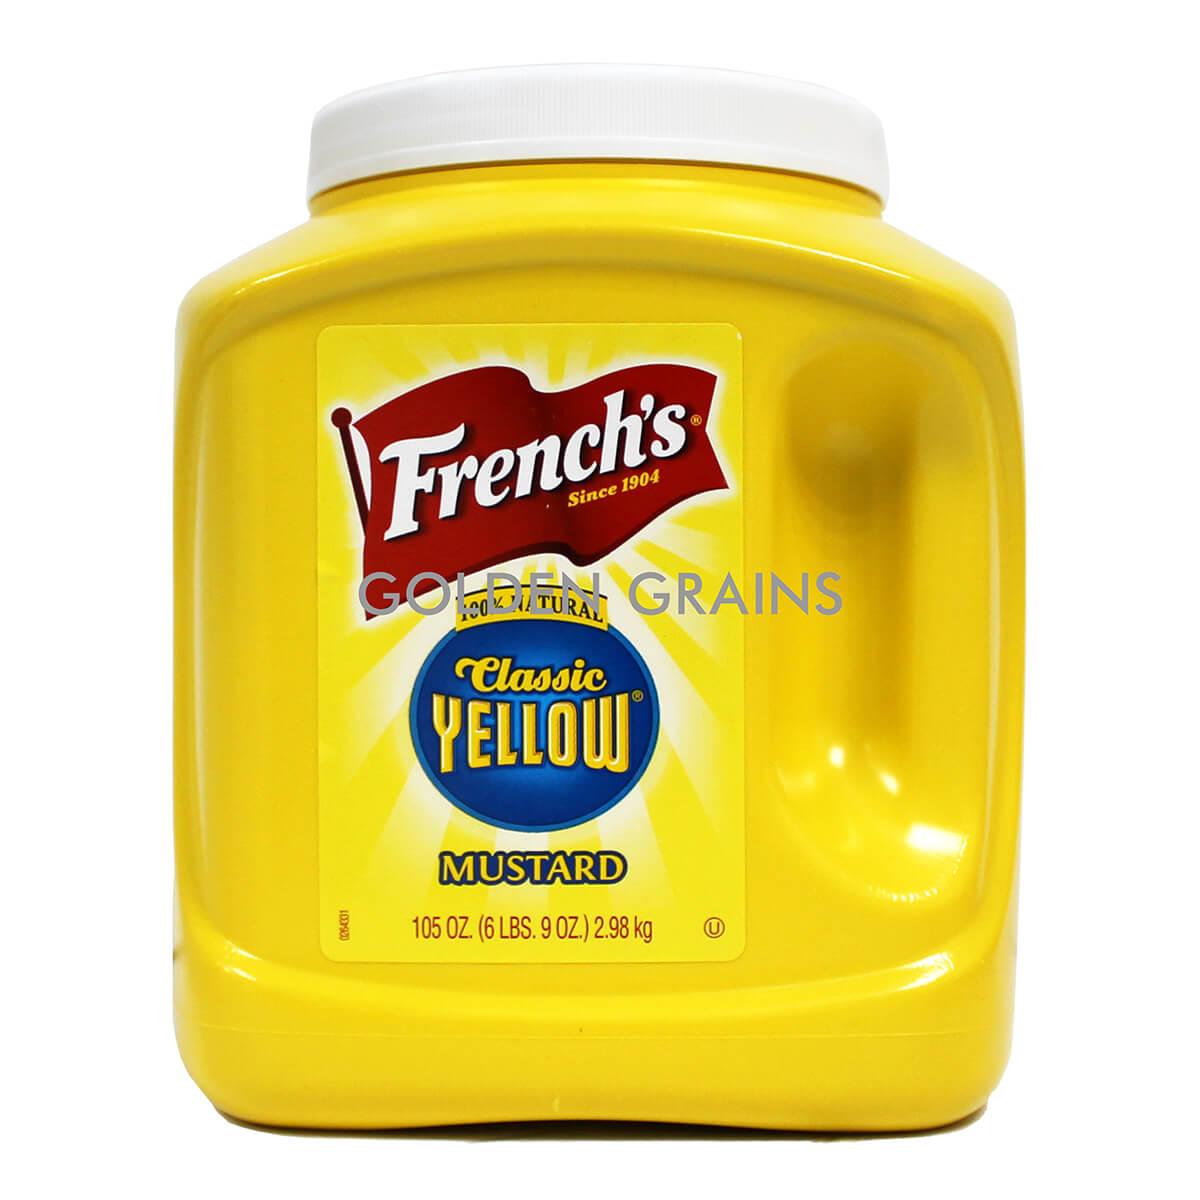 Golden Grains Dubai Export - Frenchs - Mustard Big - Front.jpg